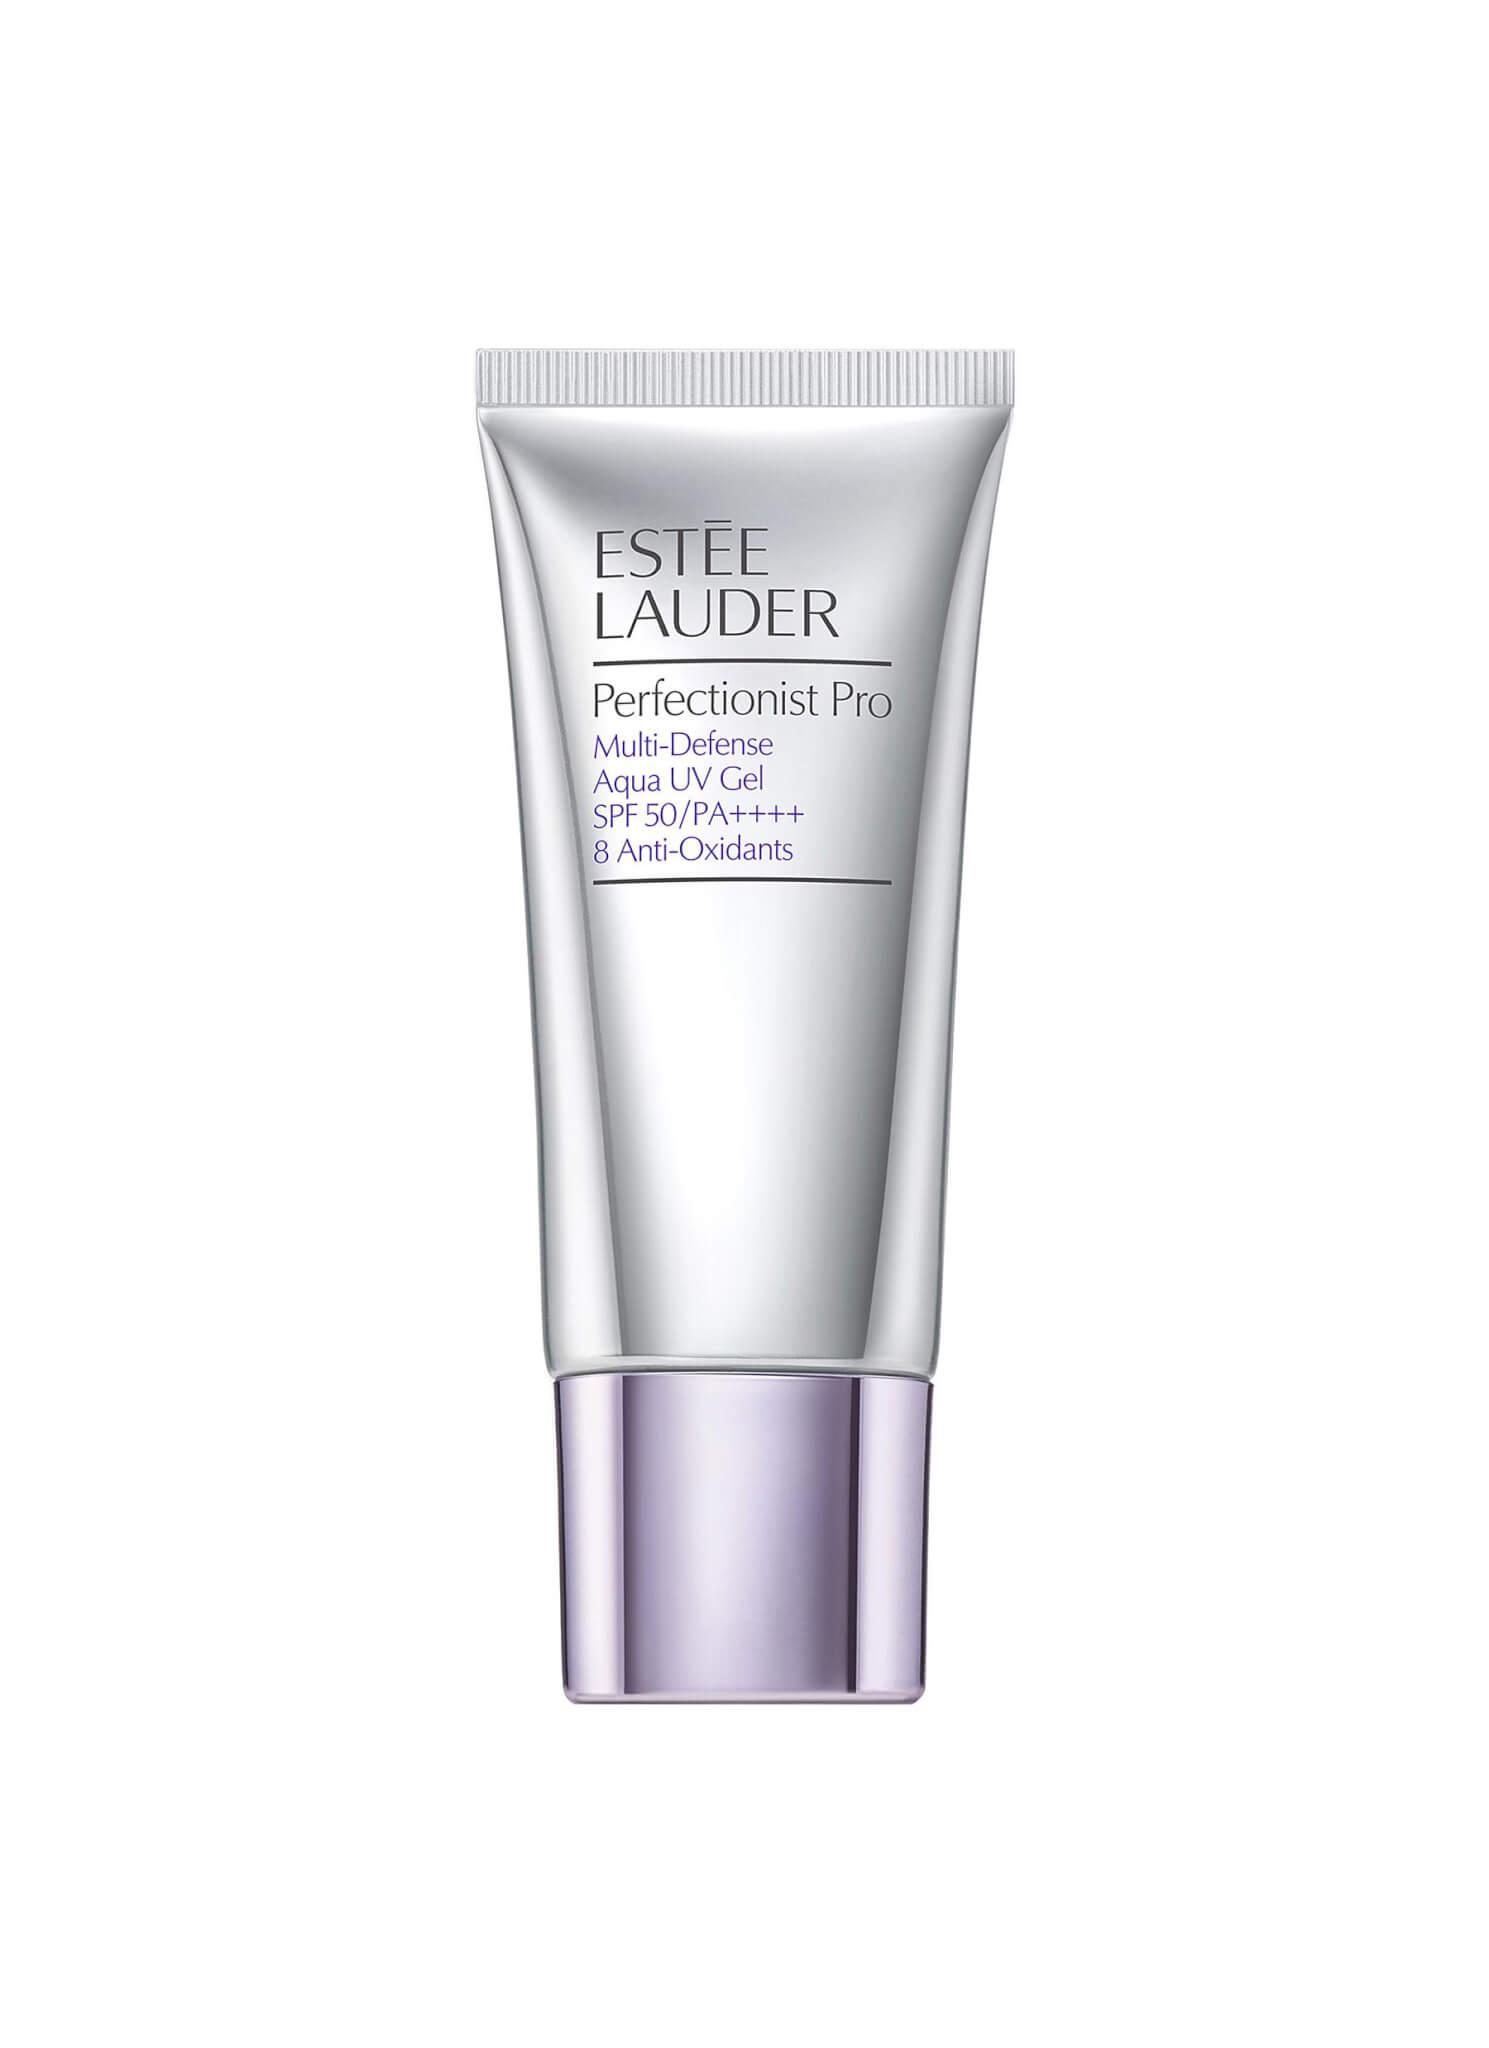 Estée Lauder Perfectionist Pro 專研水凝防曬啫喱SPF50 PA++++ $425/30ml